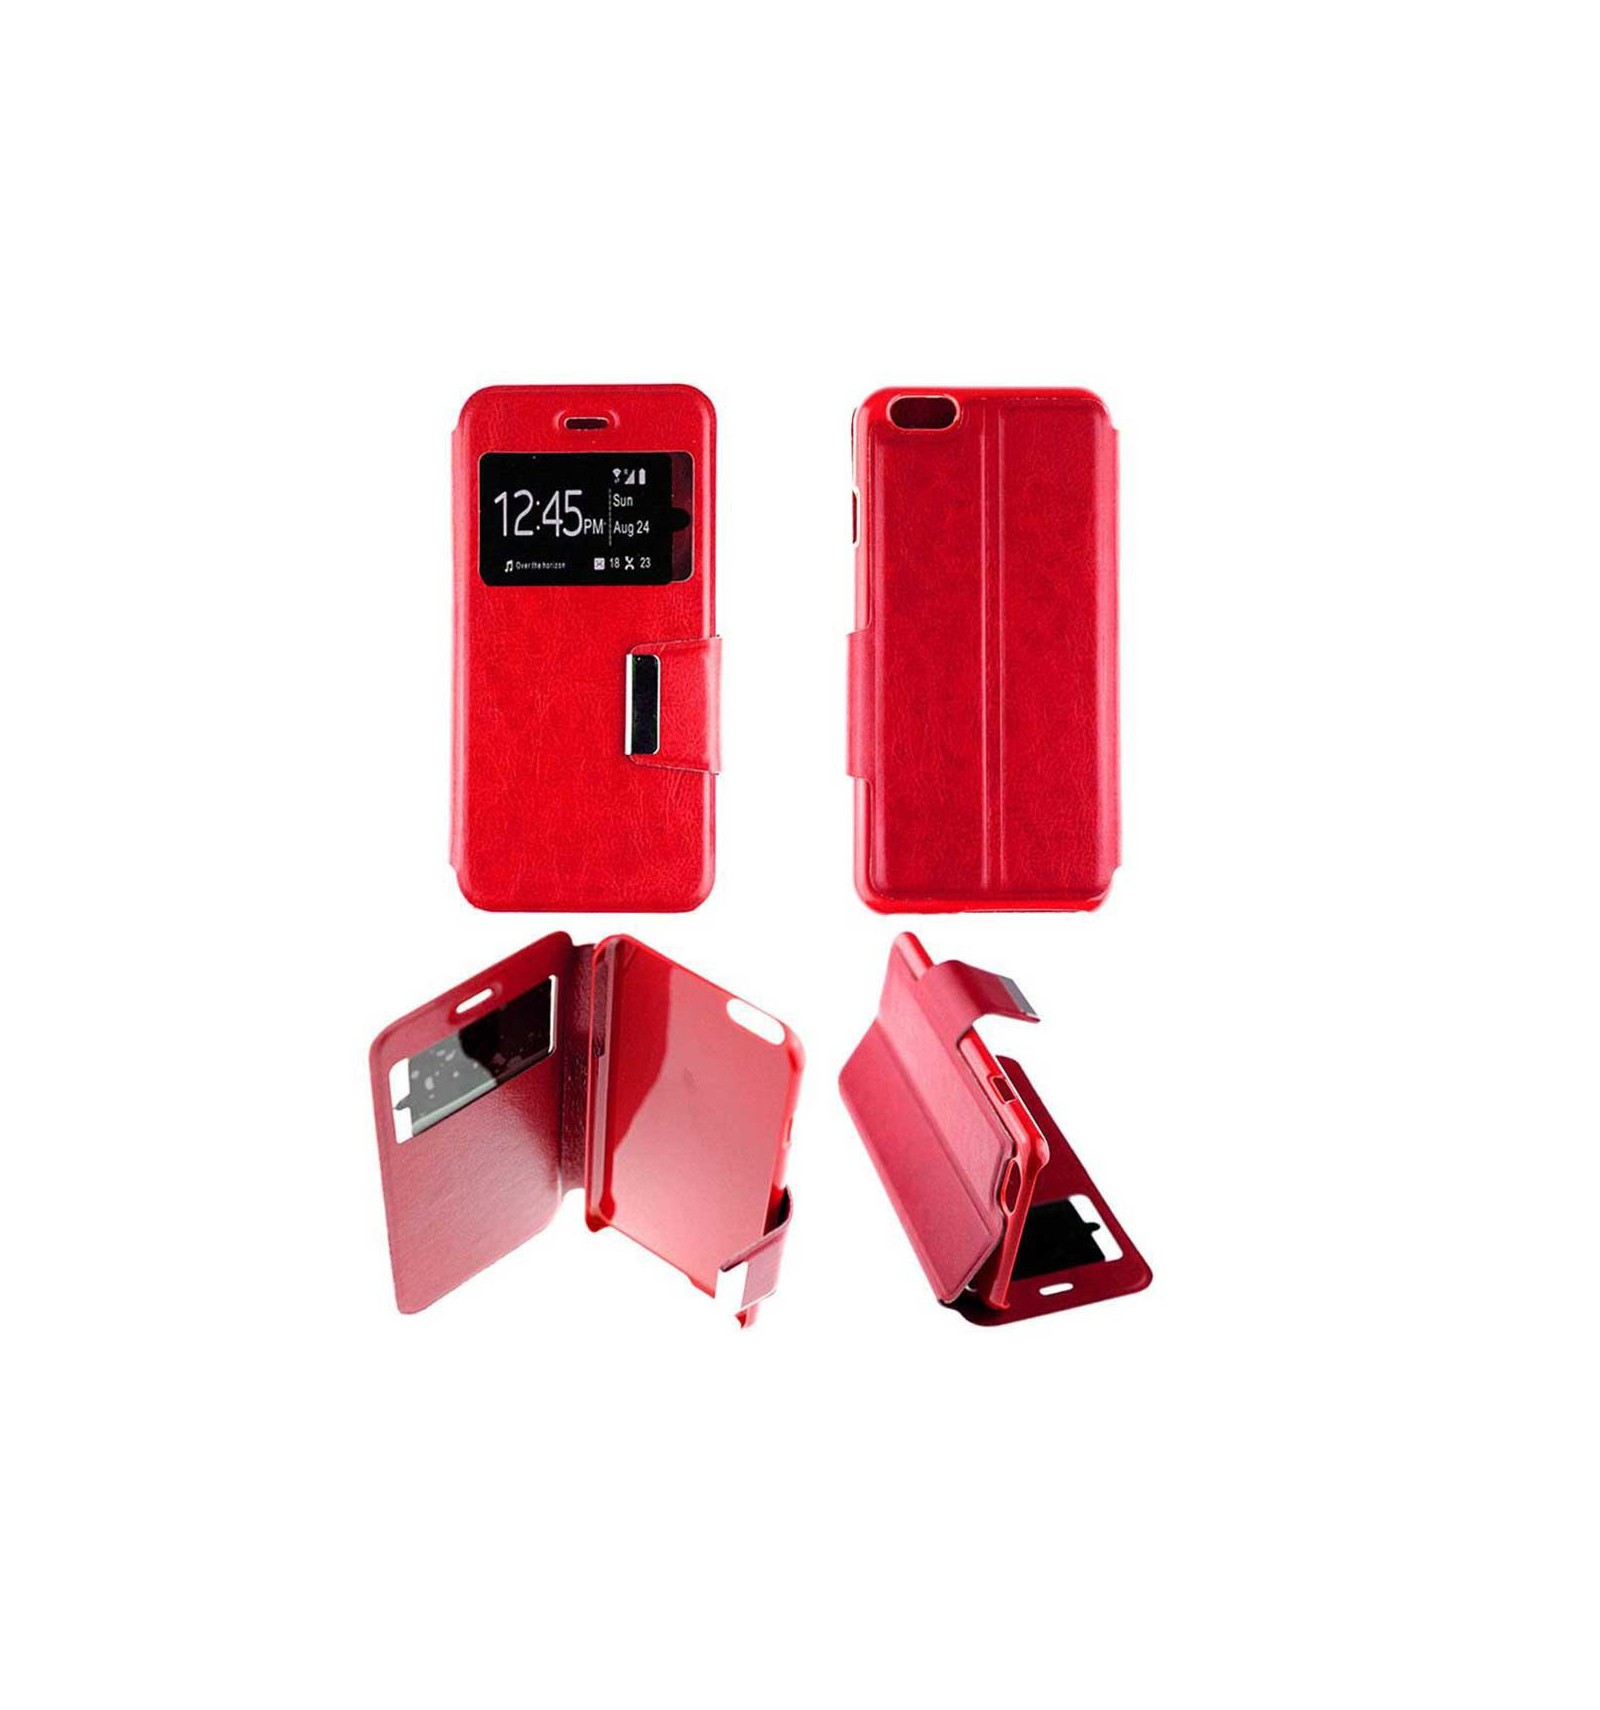 etui folio apple iphone 6 6s rouge. Black Bedroom Furniture Sets. Home Design Ideas